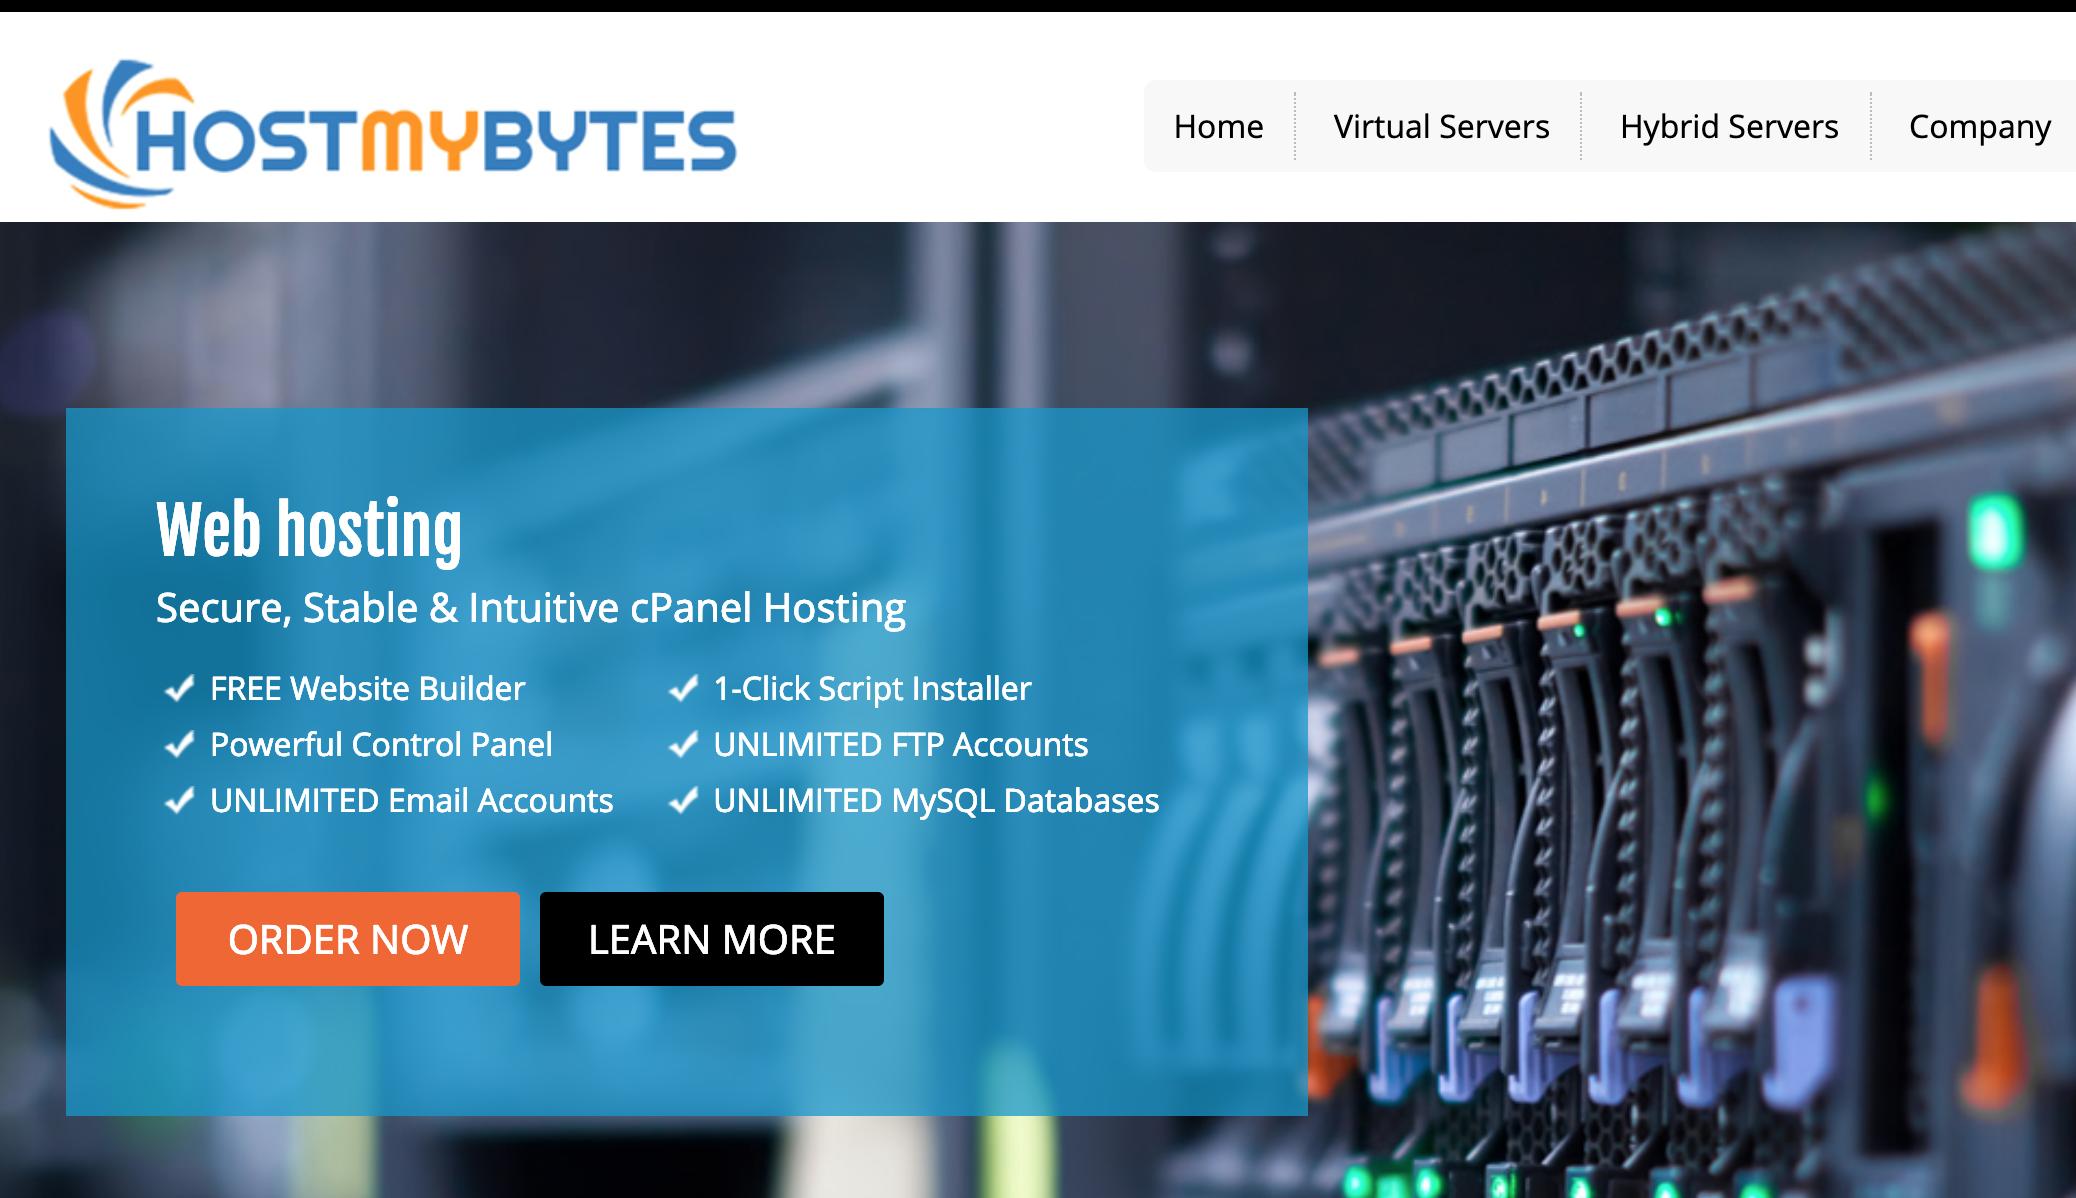 HostMyBytes亚洲优化线路洛杉矶服务器特价,年付7美元起 1GB内存 20GB存储 2TB月流量,支持支付宝、IPv6,HostMyBytes优惠码